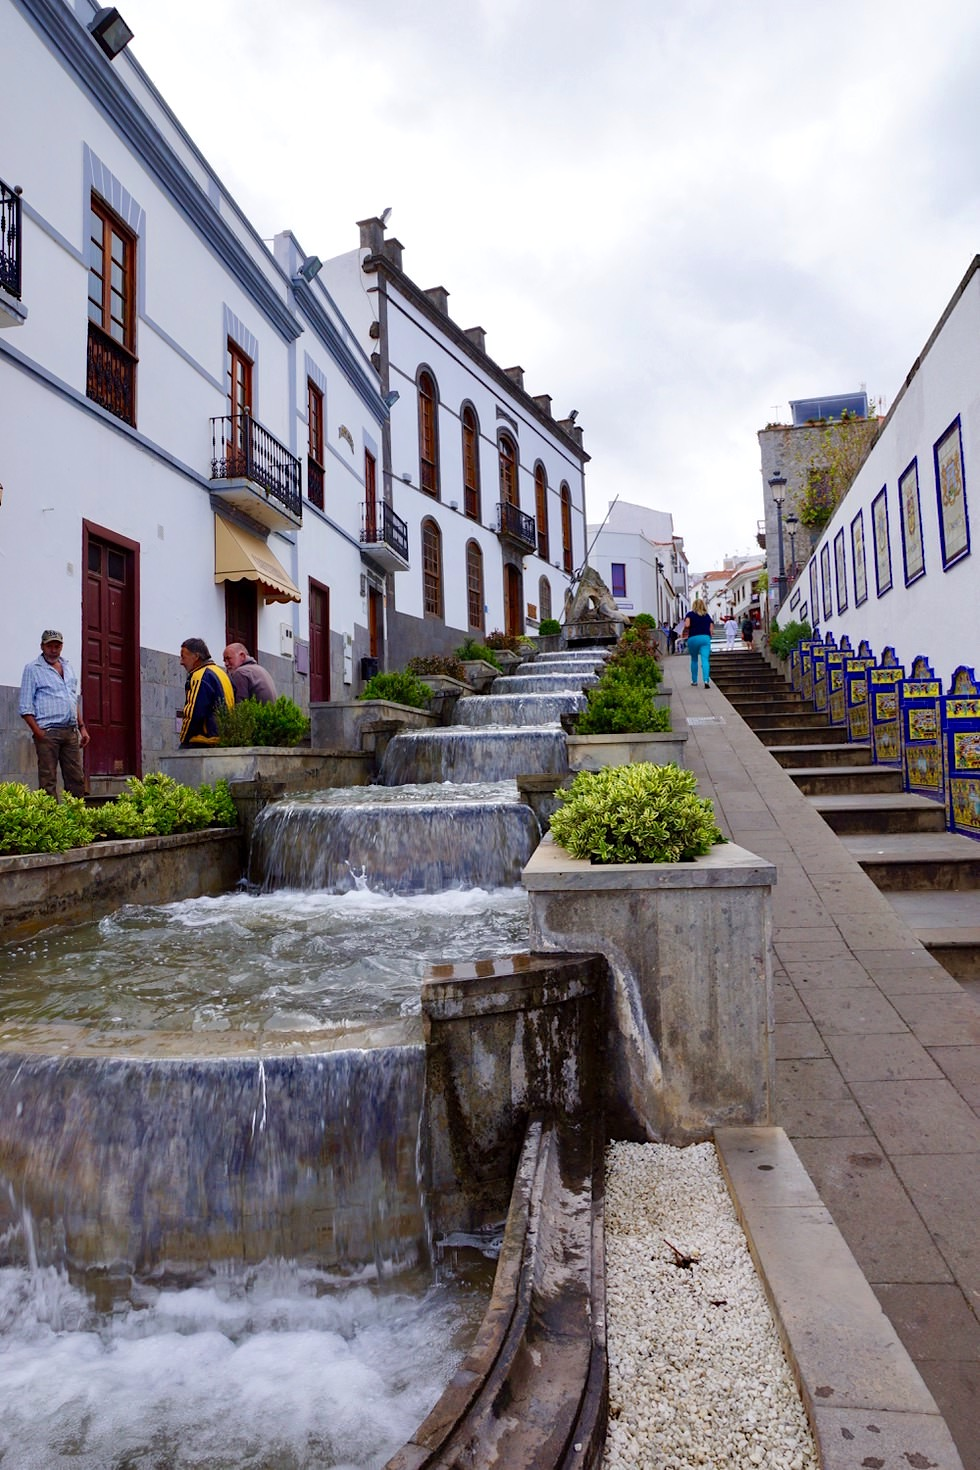 Firgas - Paseo de Gran Canaria: die berühmte Wasserfall-Straße in der Altstadt - Gran Canaria Highlights